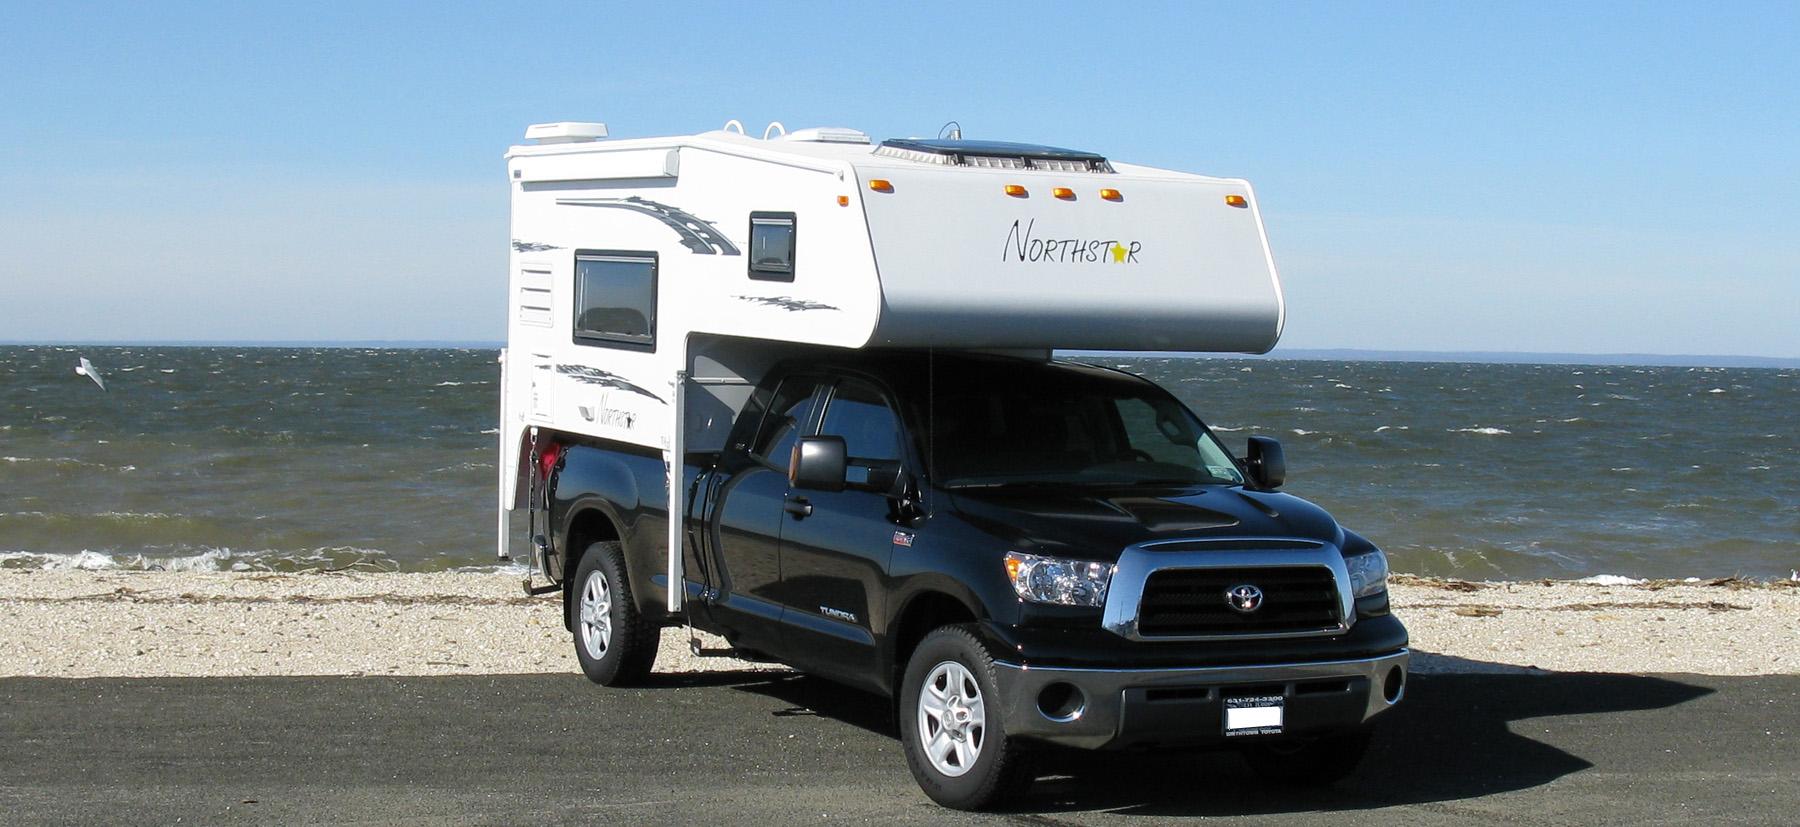 Northstar Campers Wiring Diagram Trusted Schematics Generator Lance Truck Camper Nissan